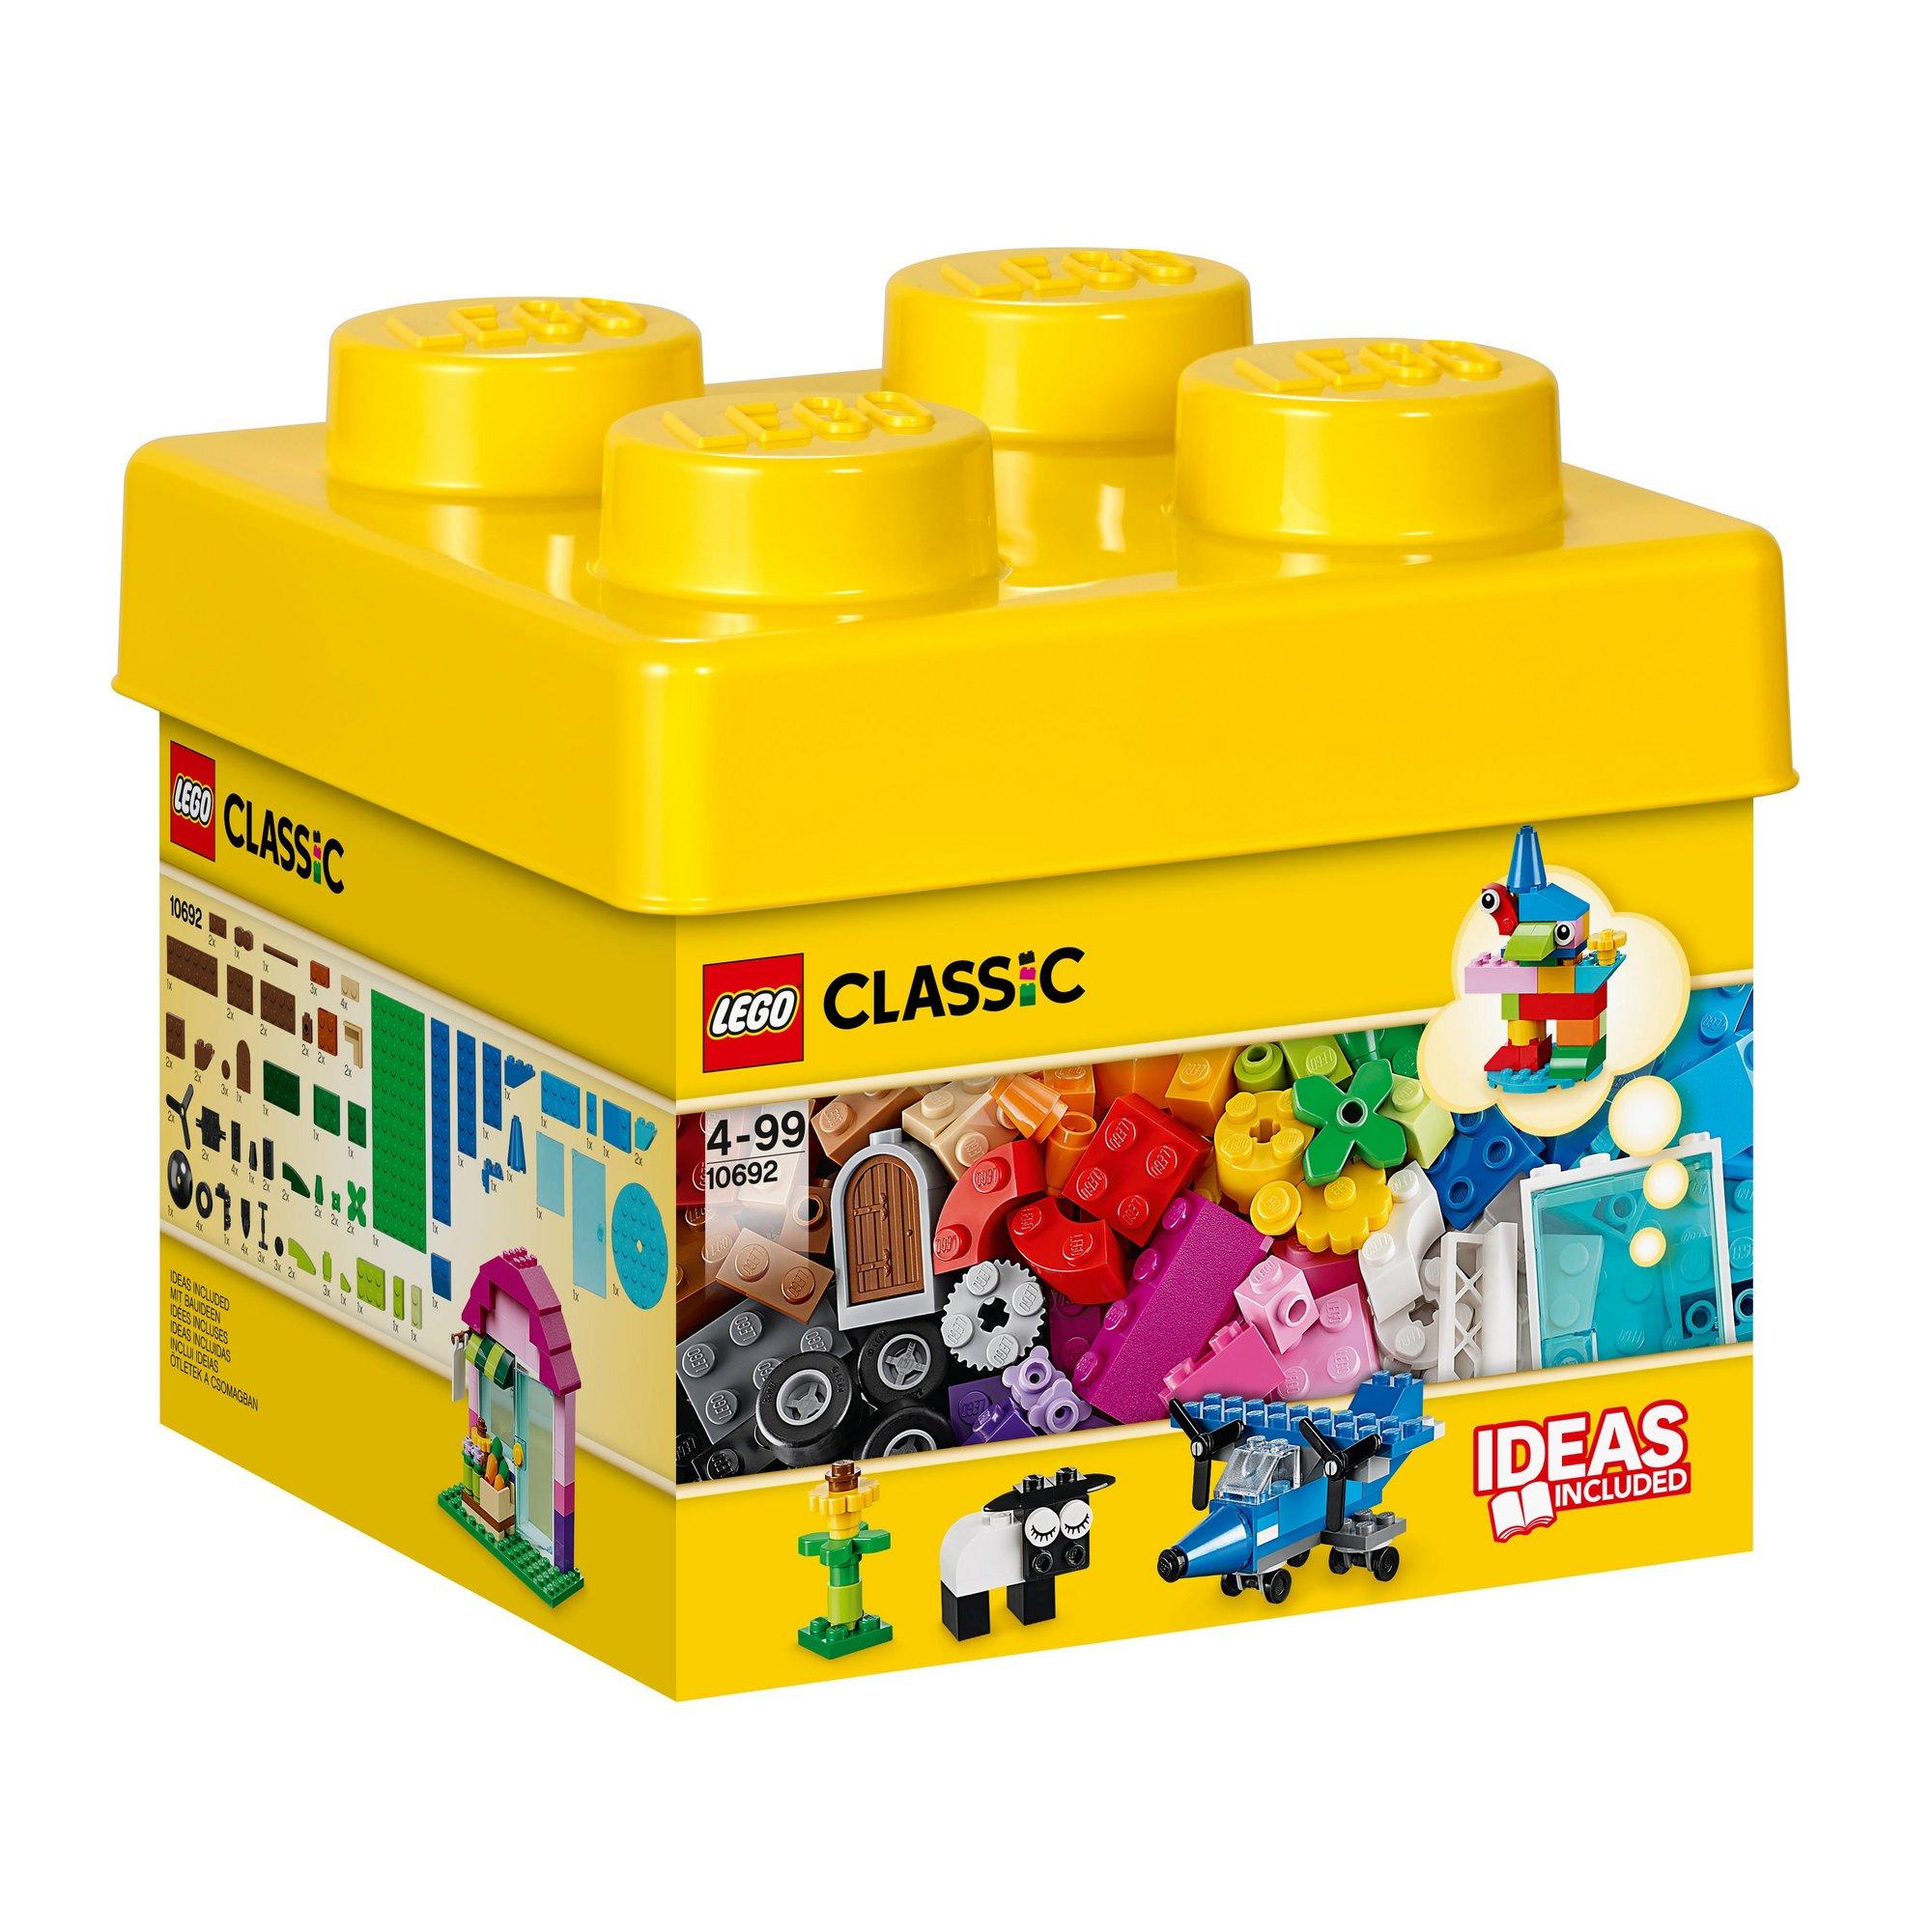 Image of LEGO Classic LEGO Creative Bricks